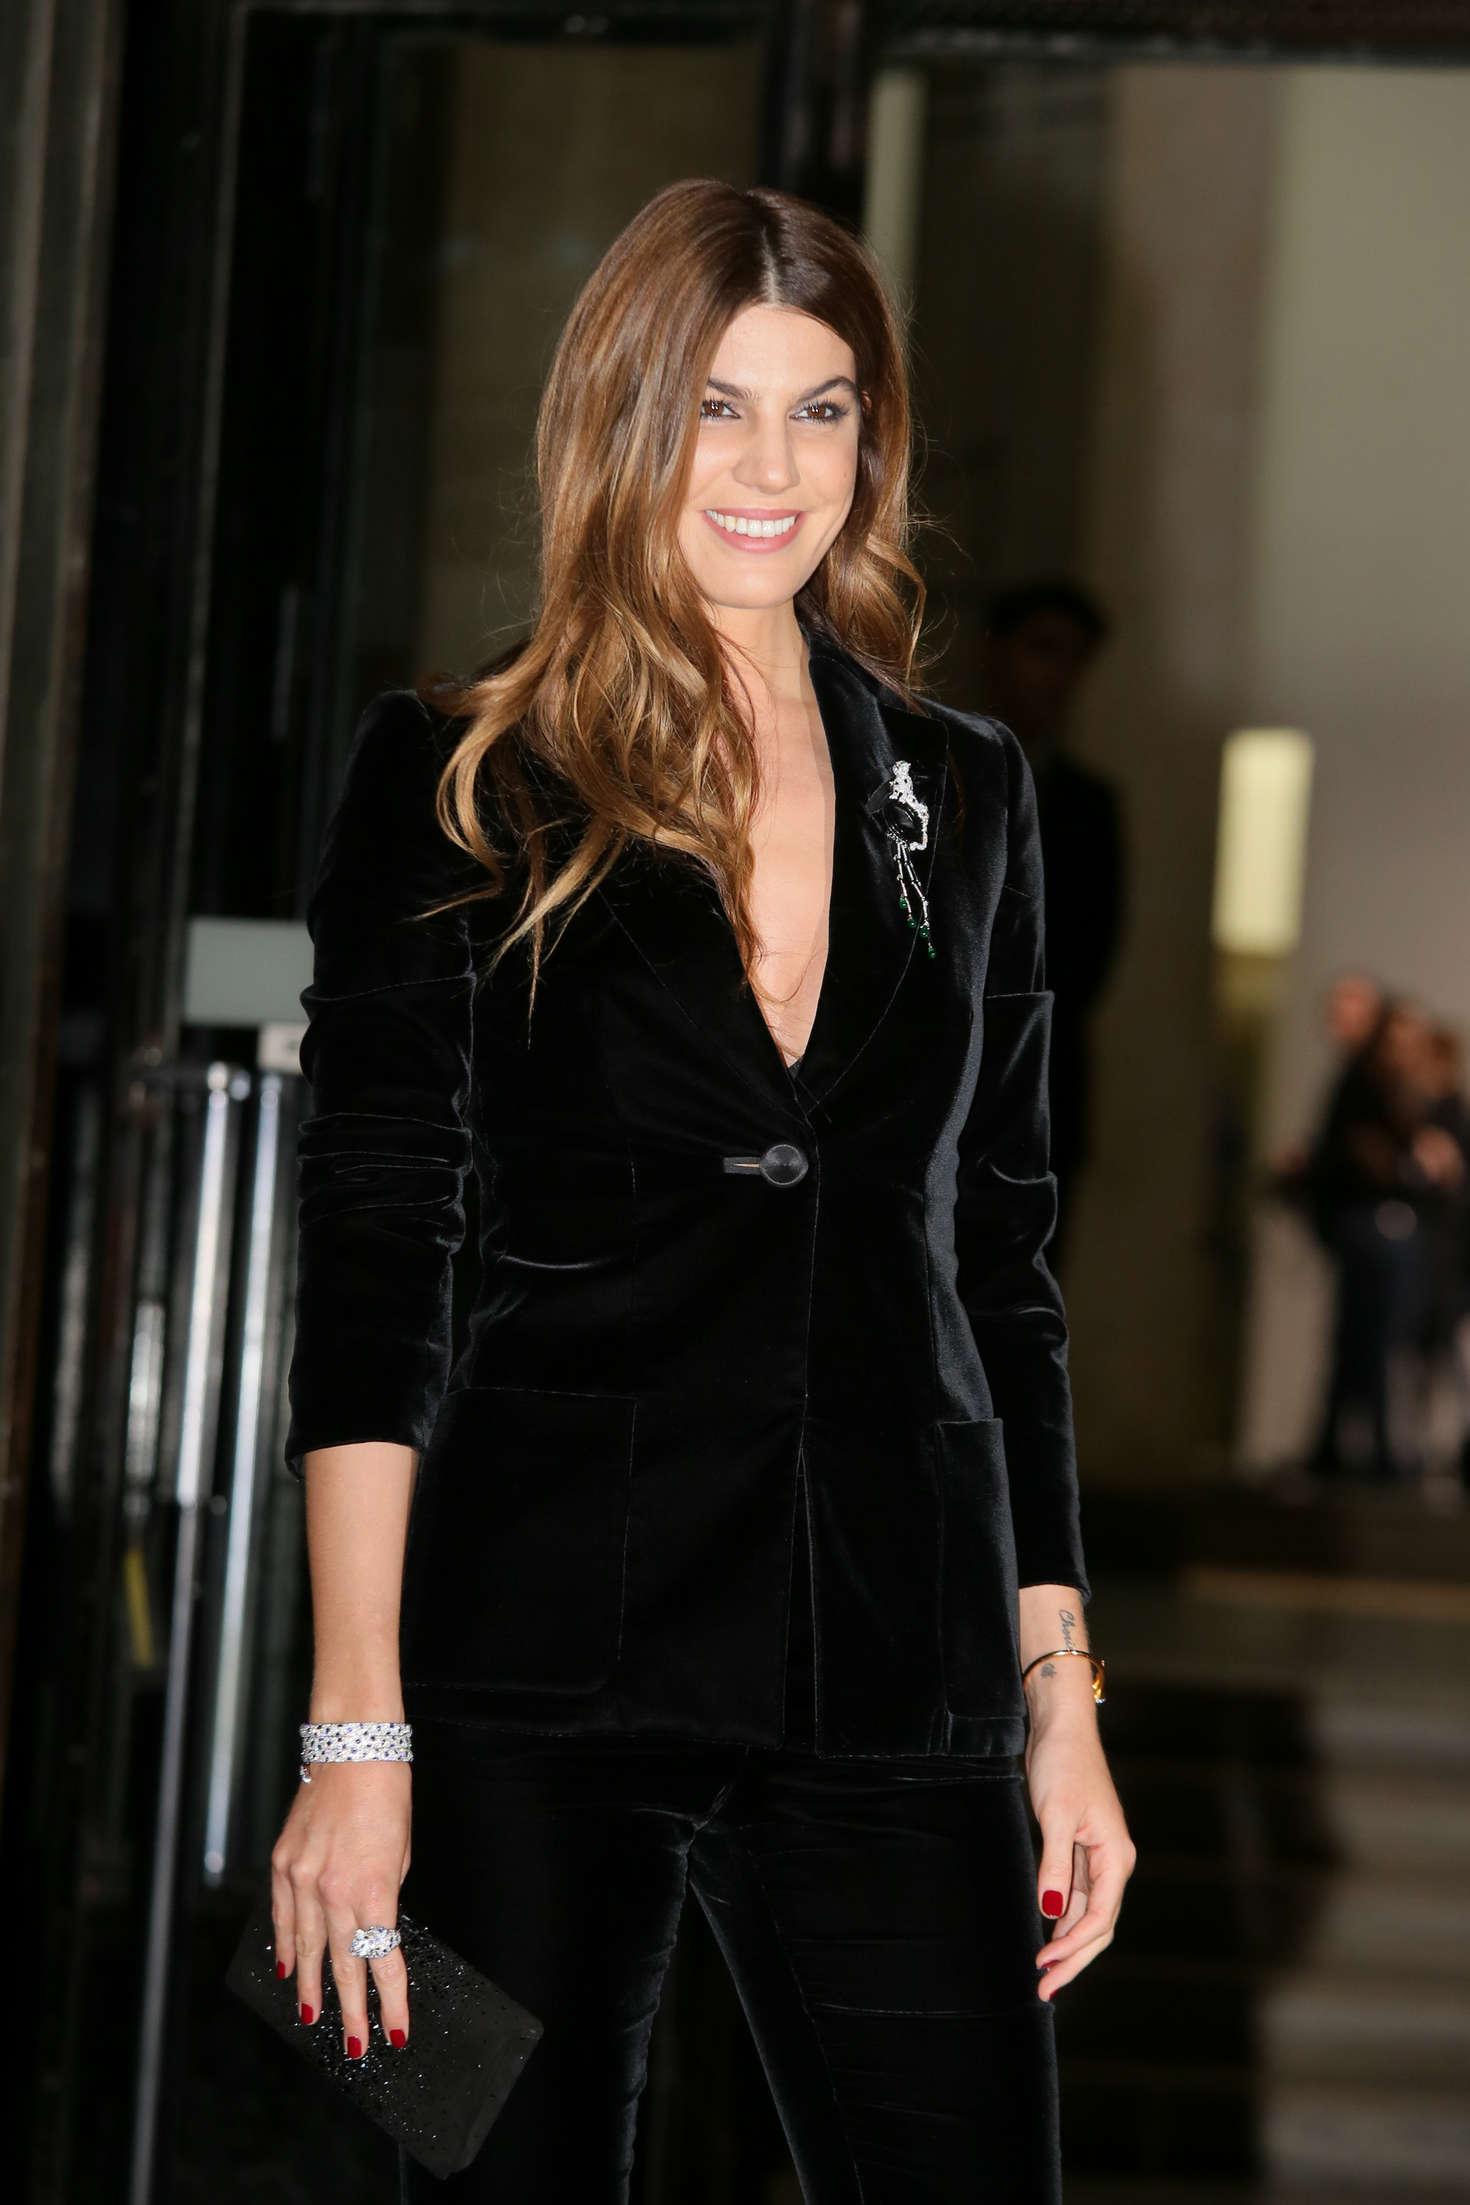 Bianca Brandolini 2016 : Bianca Brandolini Arrivals at Giorgio Armani Fashion Show SS 2016 -04